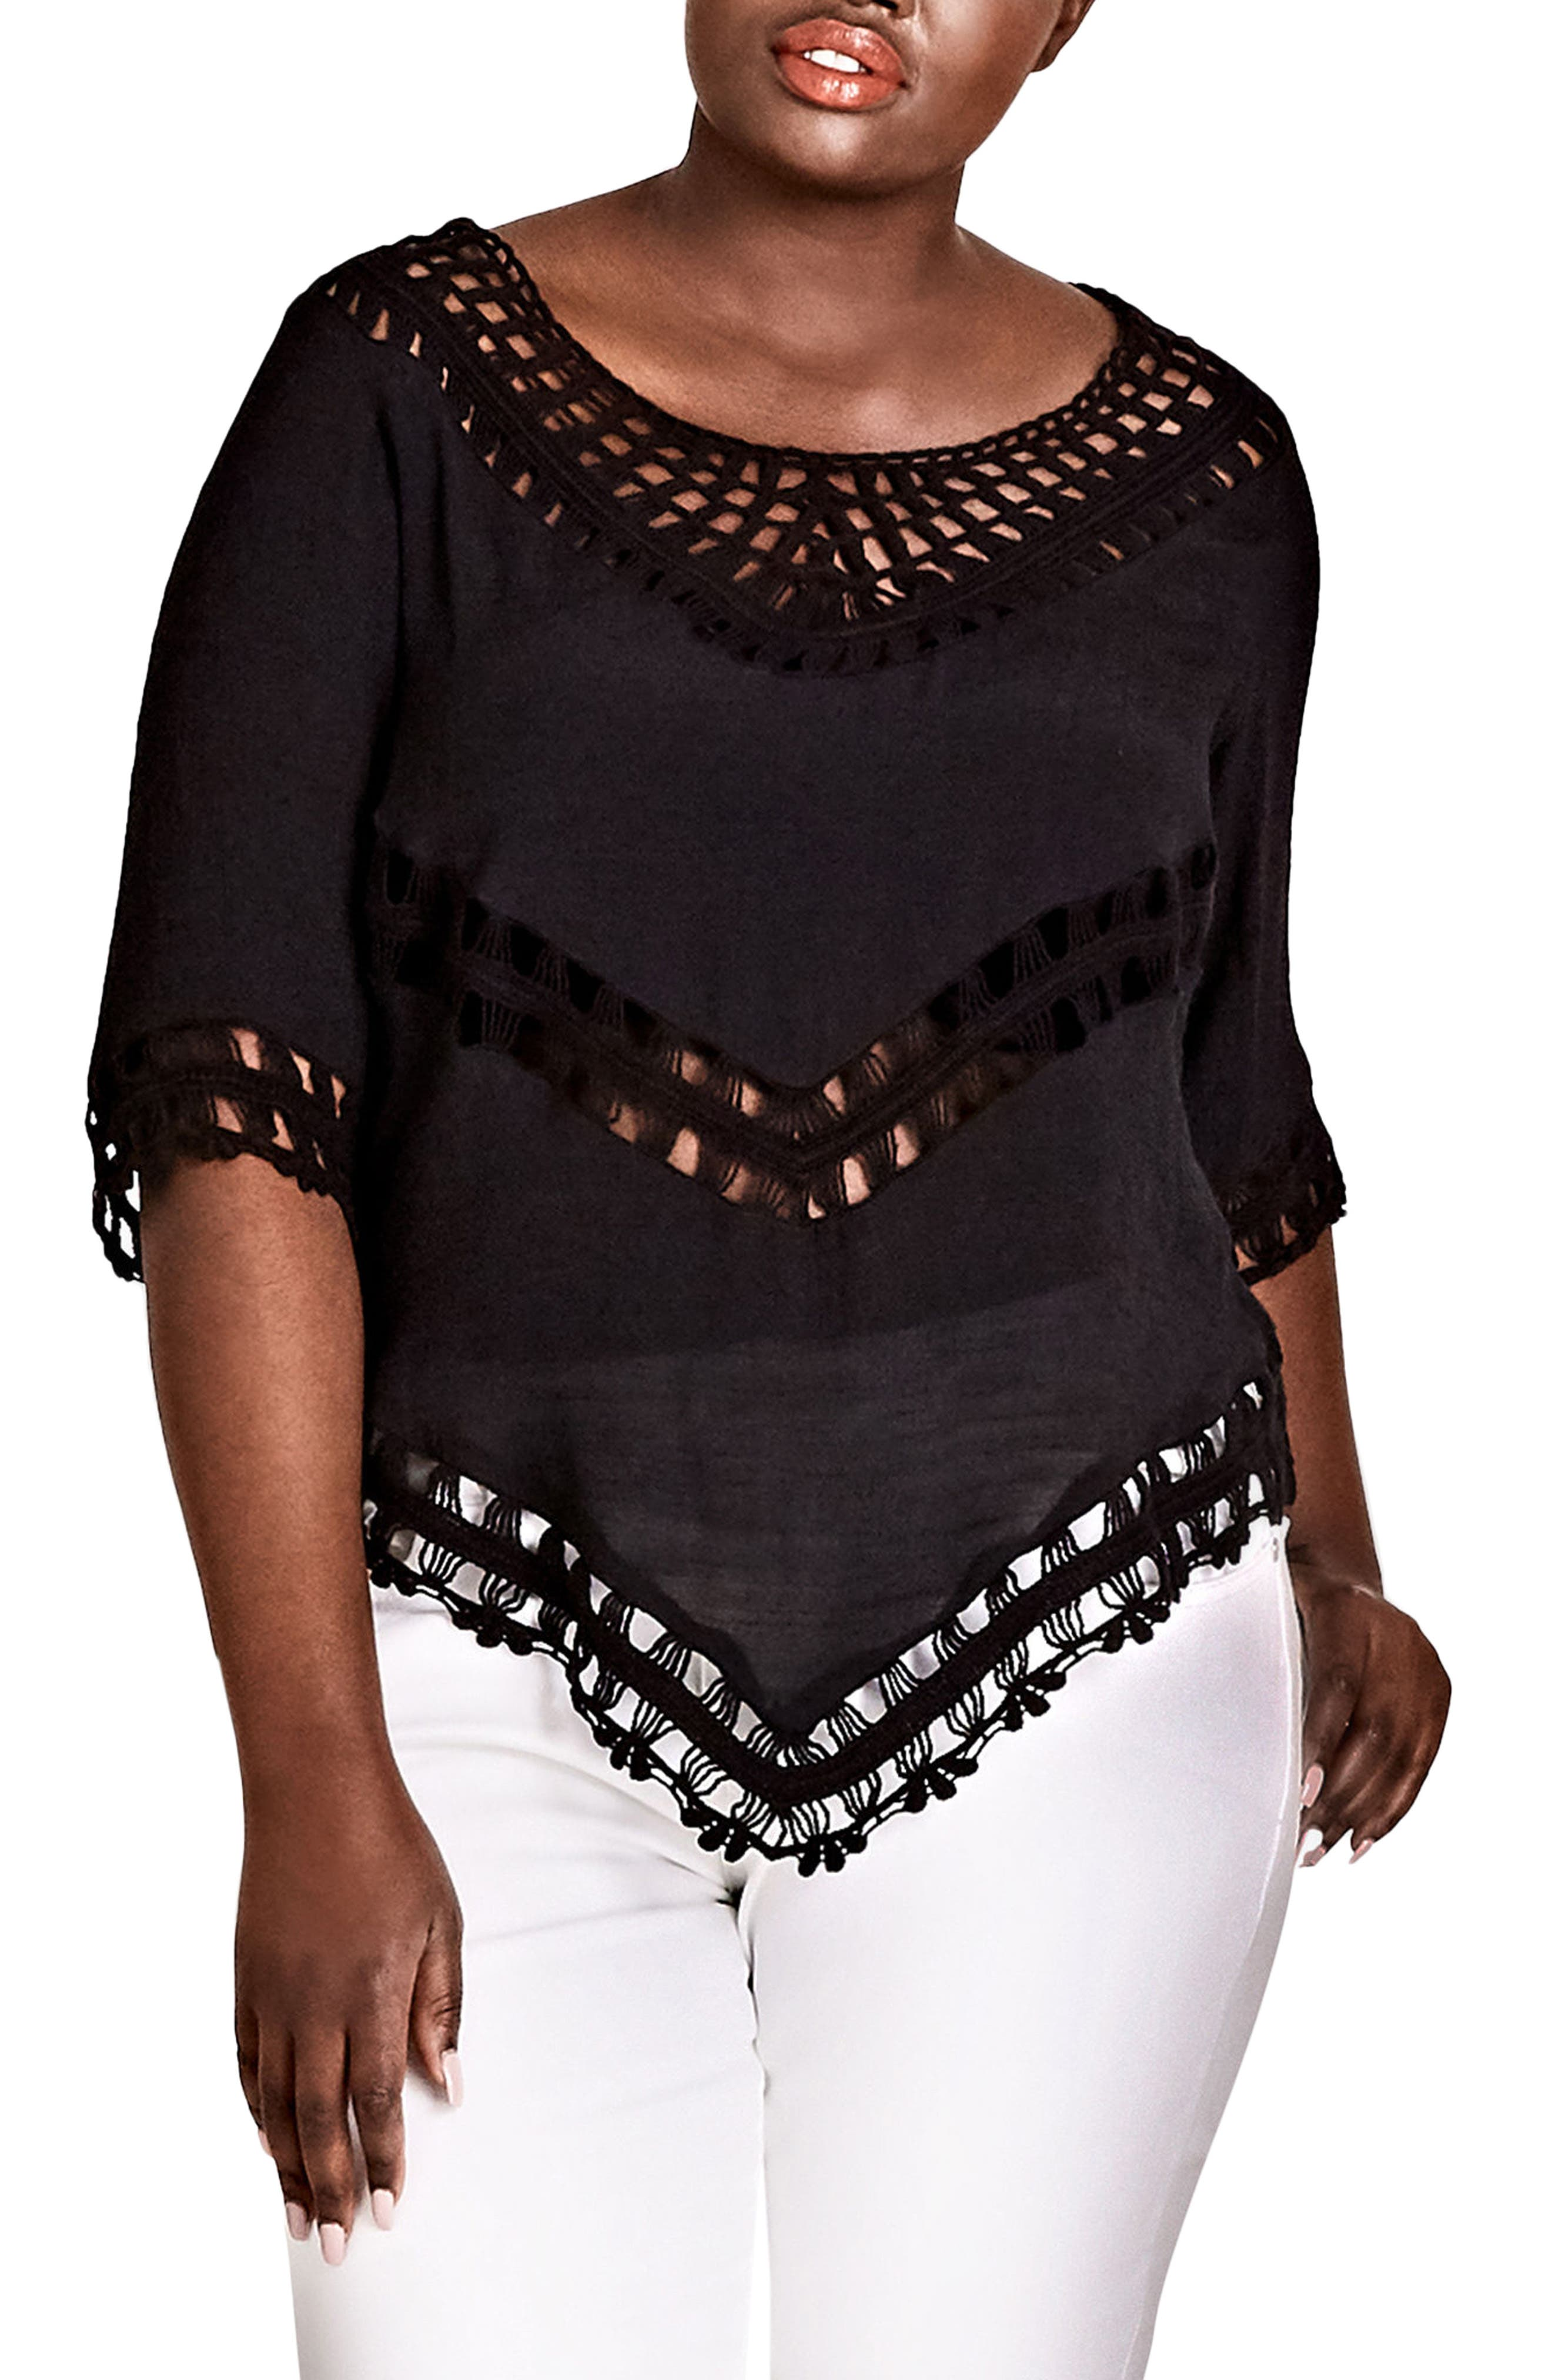 Main Image - City Chic Sweet Vibe Crochet Top (Plus Size)